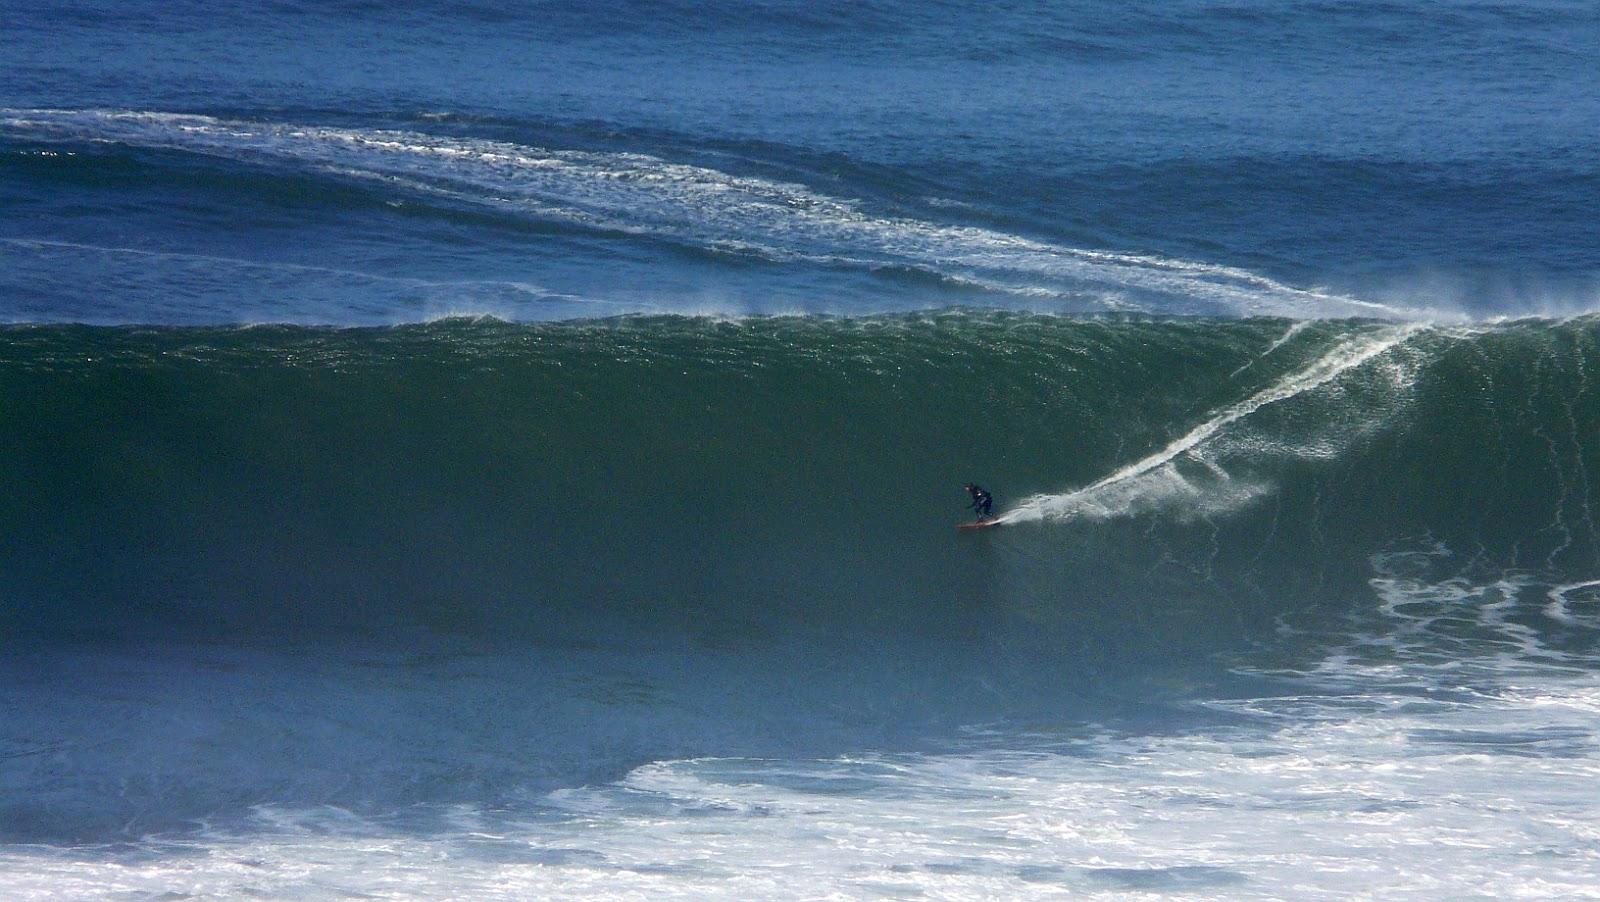 surf golf galea getxo bizkaia%2B%25284%2529